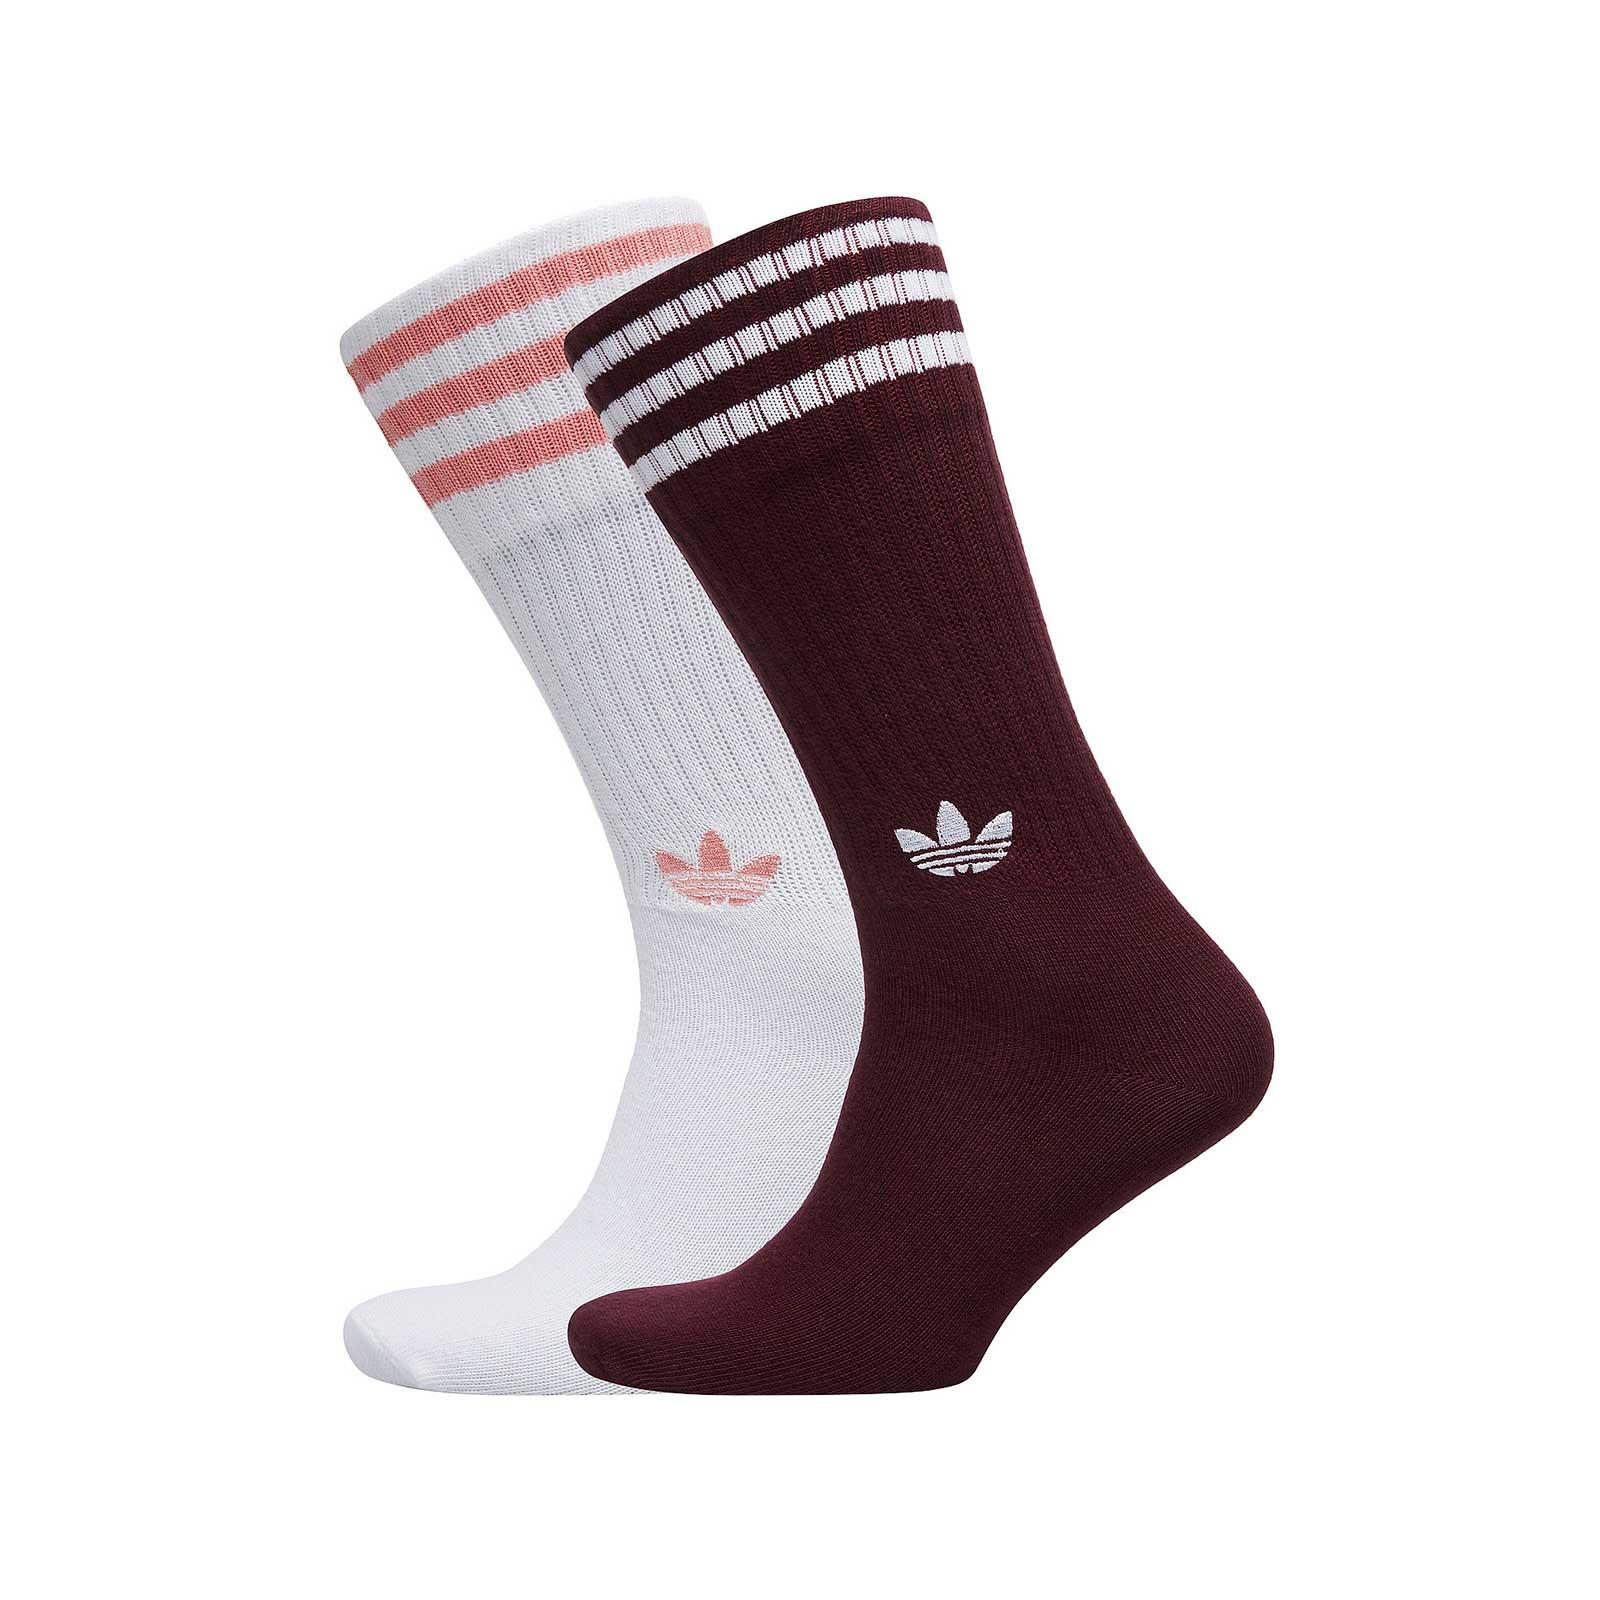 b5e30d62e Adidas Socks Solid Crew Maroon Burgundy/White Multicolour   eBay